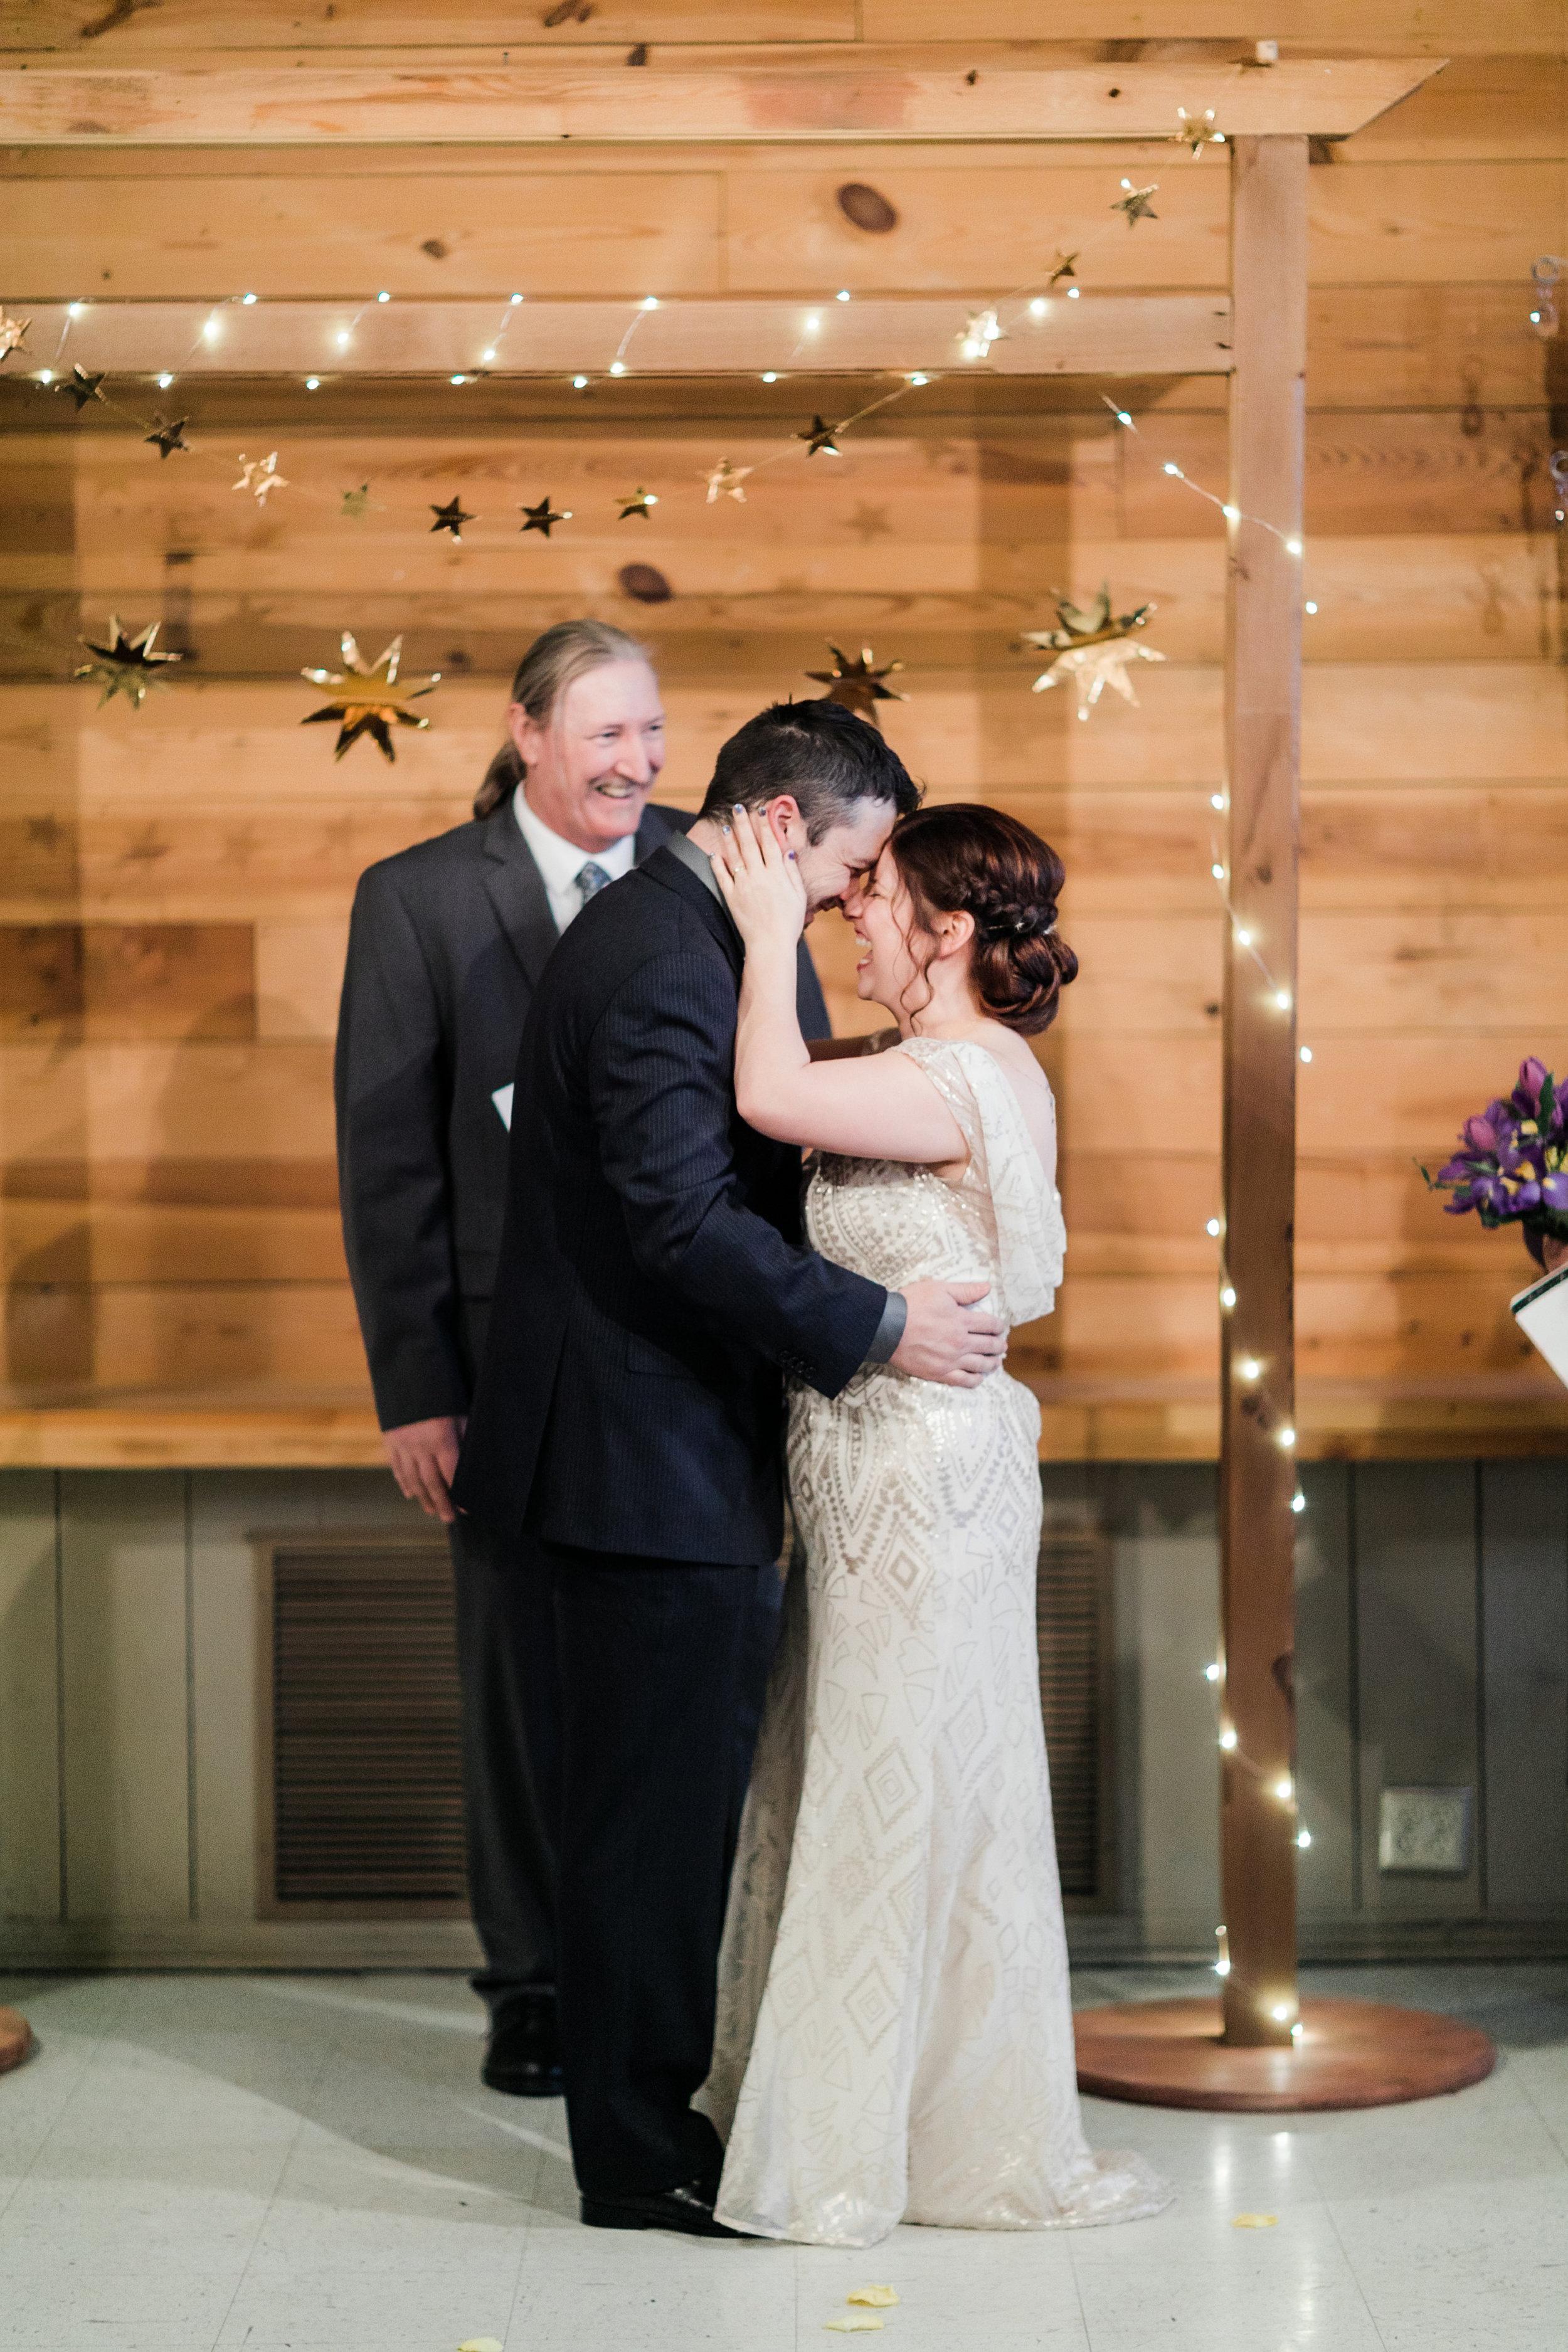 the-rock-barn-henrietta-wedding-photographer-texas-wichita-falls-earth-day-wedding-026.jpg